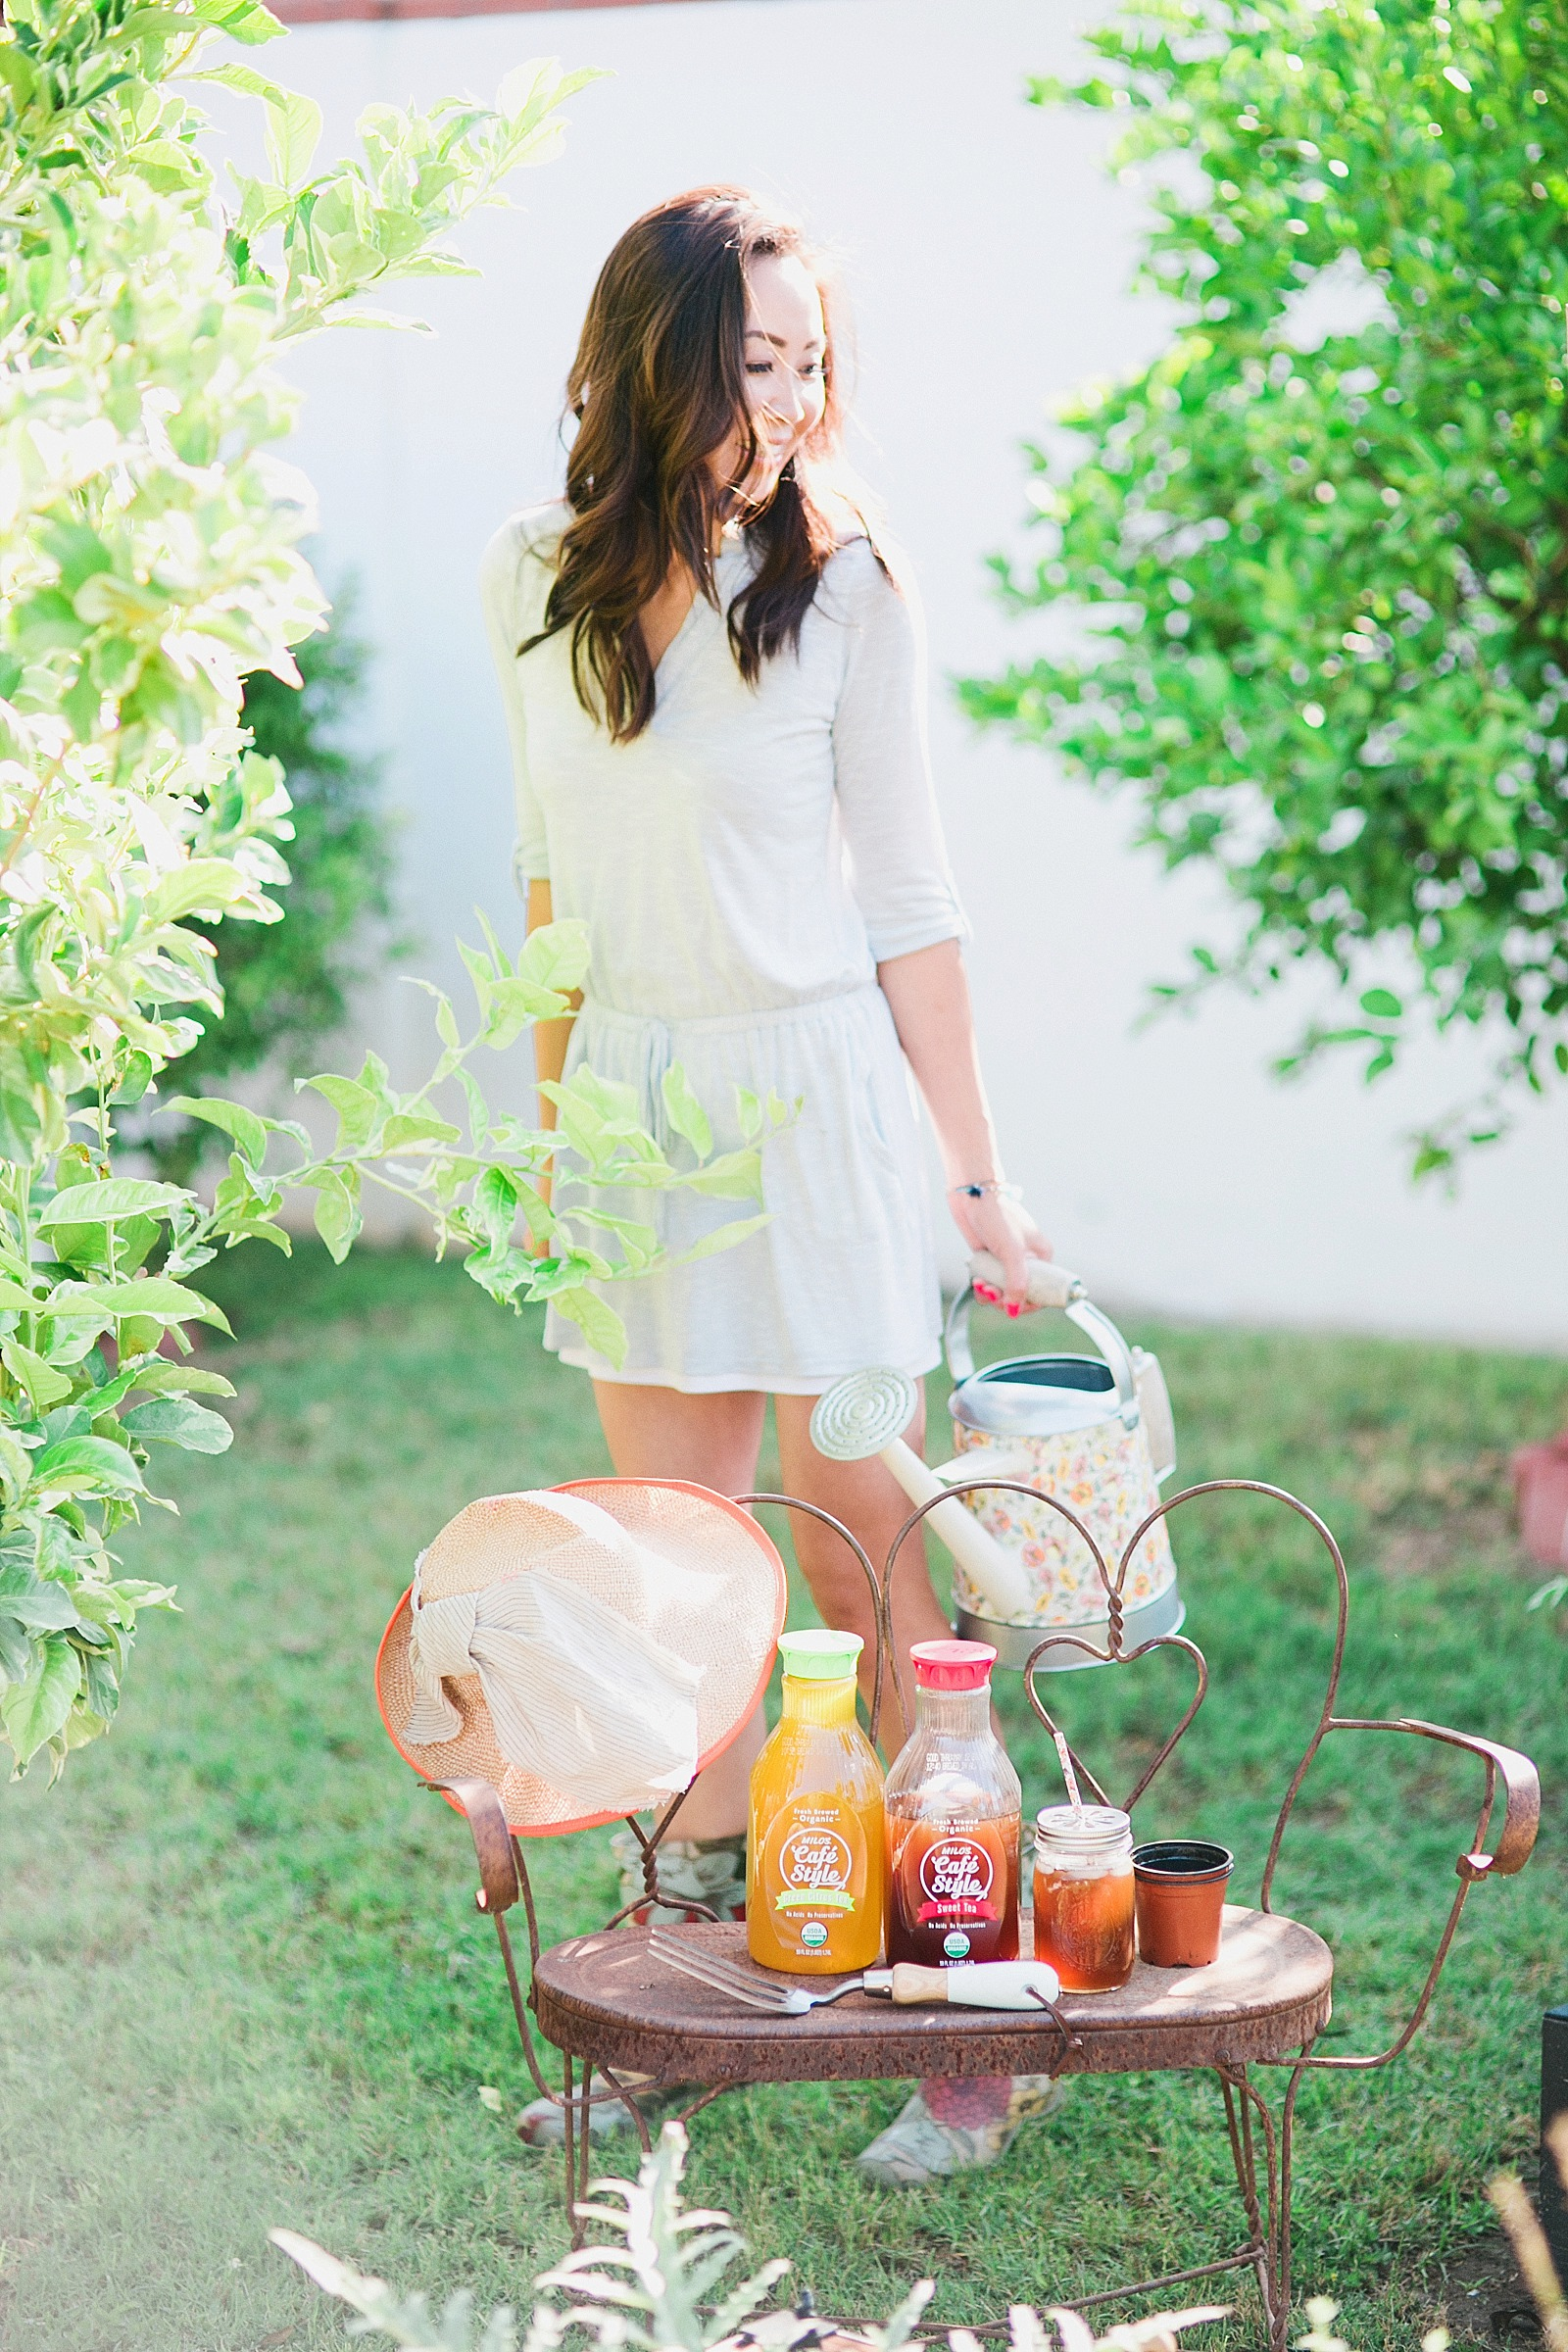 milo-iced-tea-gardening-lifestyle-blogger-diana-elizabeth-blog_0058